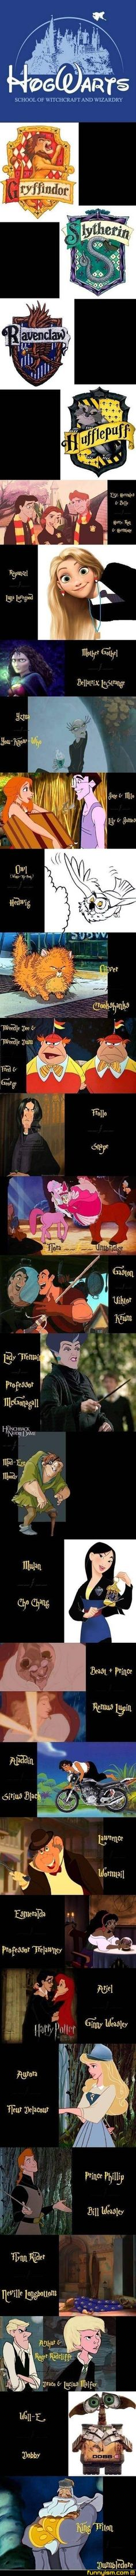 Hogwarts Disney